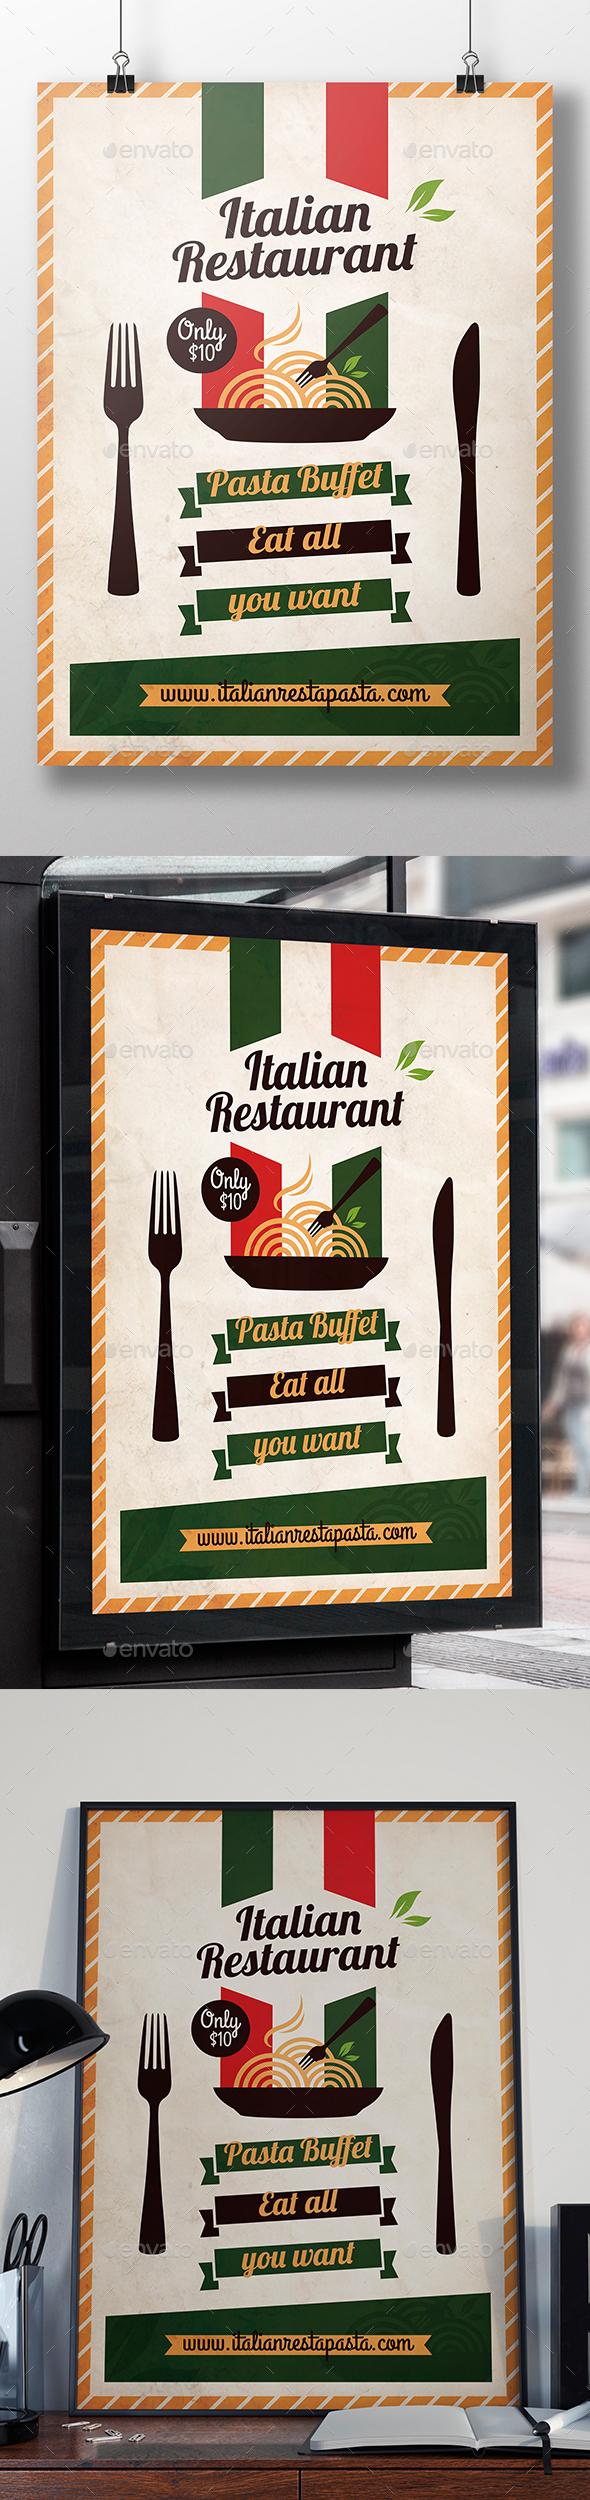 Italian Restaurant Flyer Template - Restaurant Flyers